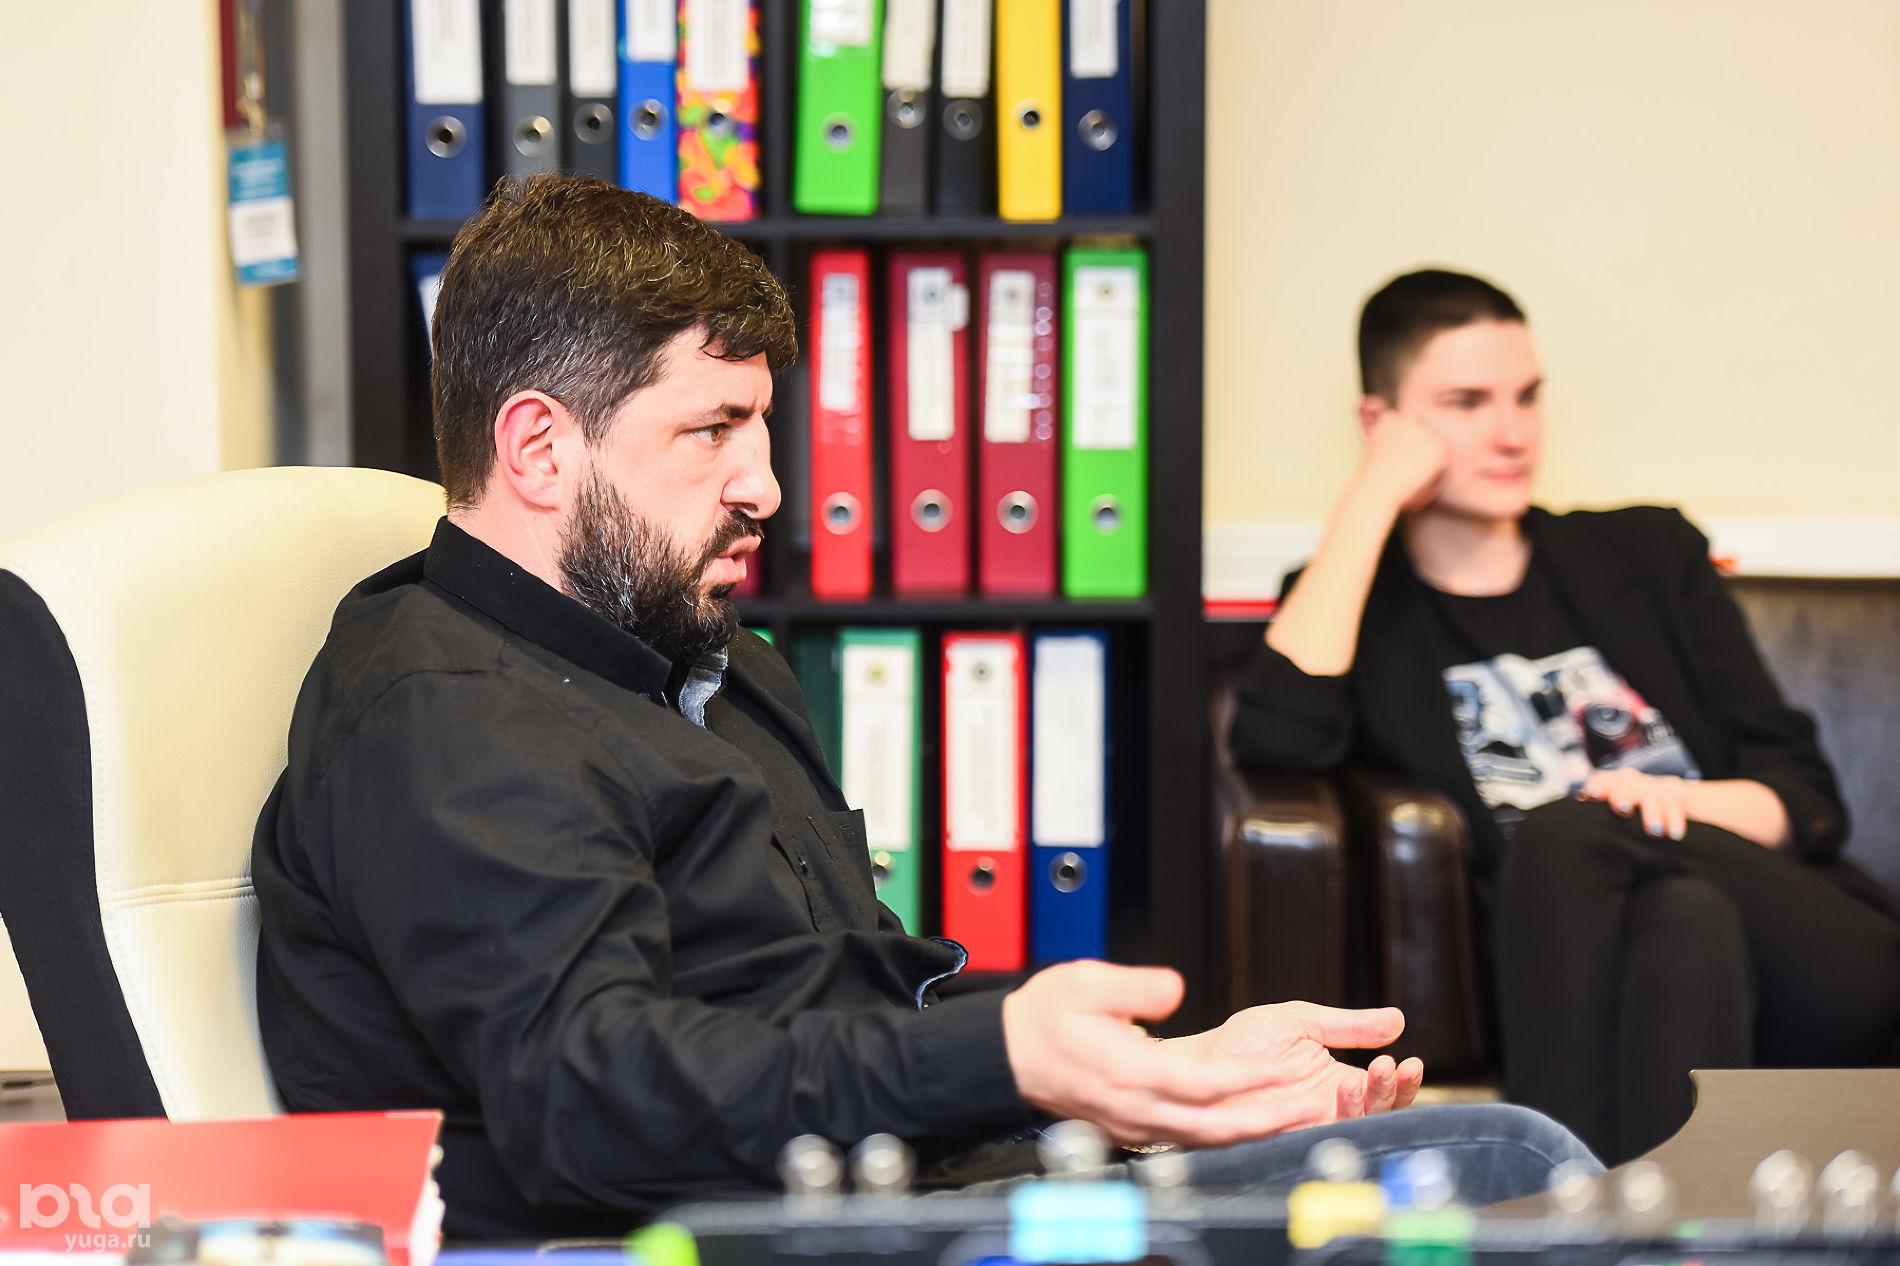 Алексей Аванесян и Юлия Федотова ©Фото Елены Синеок, Юга.ру